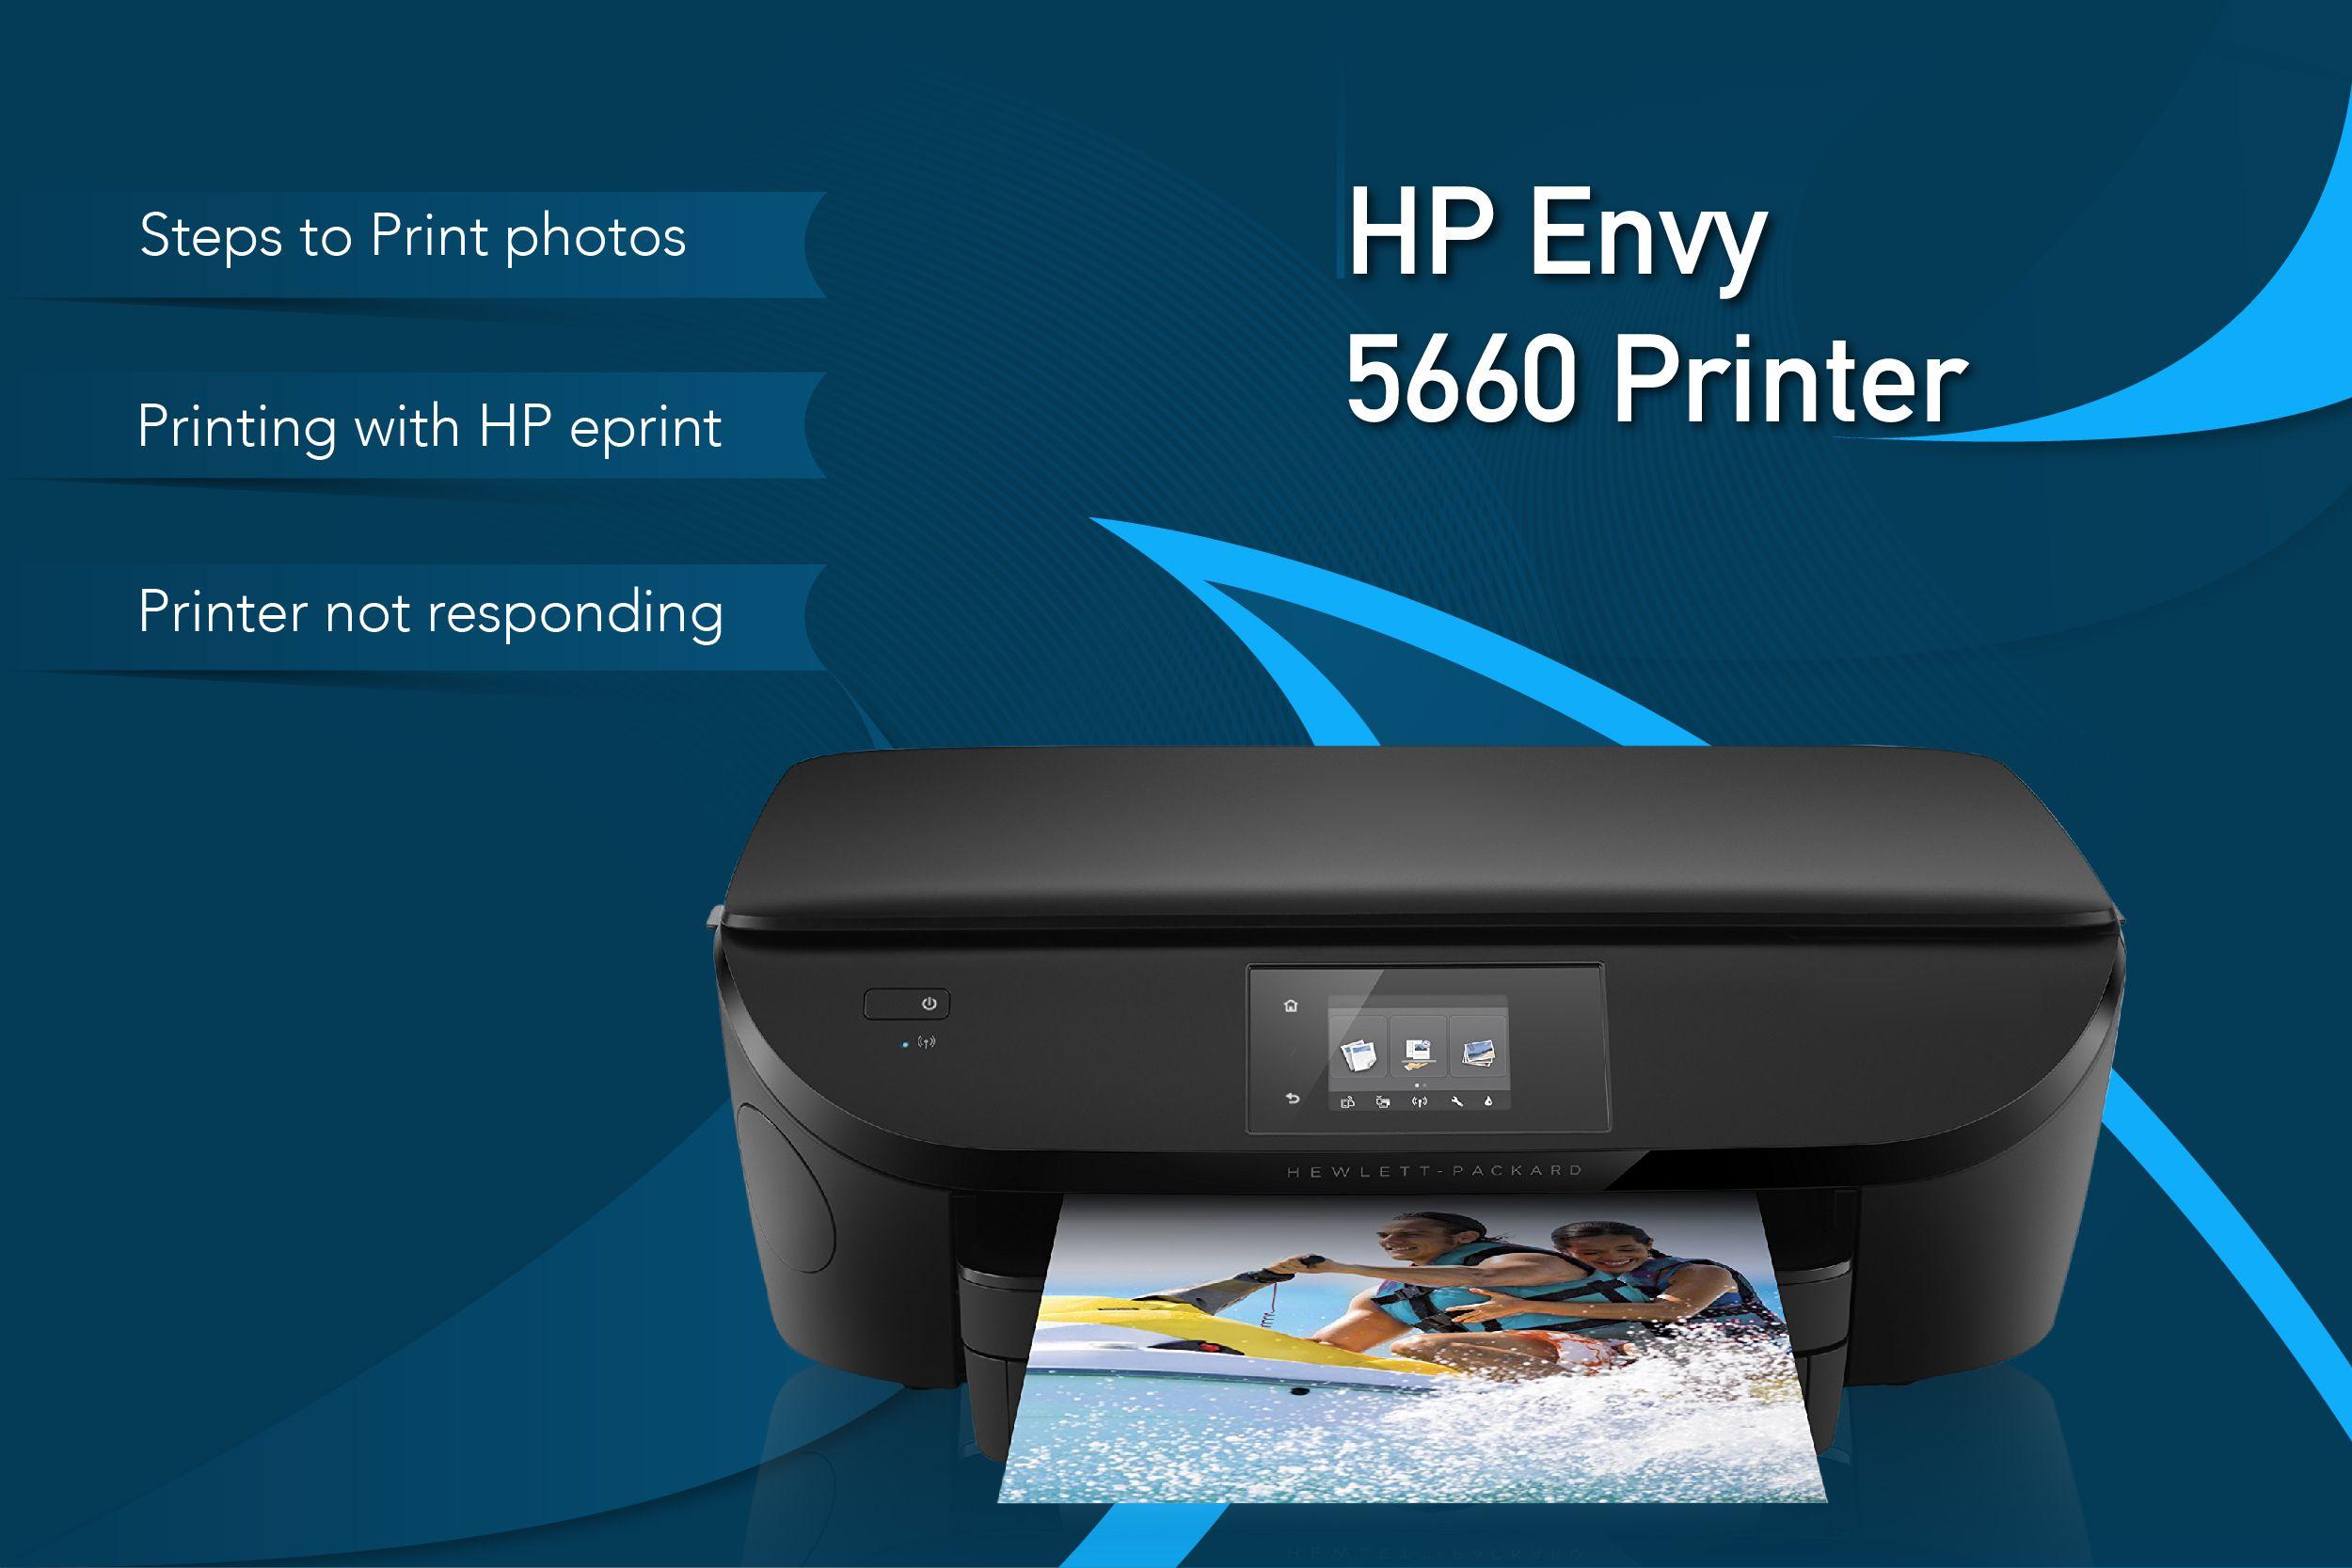 hp envy 5660 series printer driver